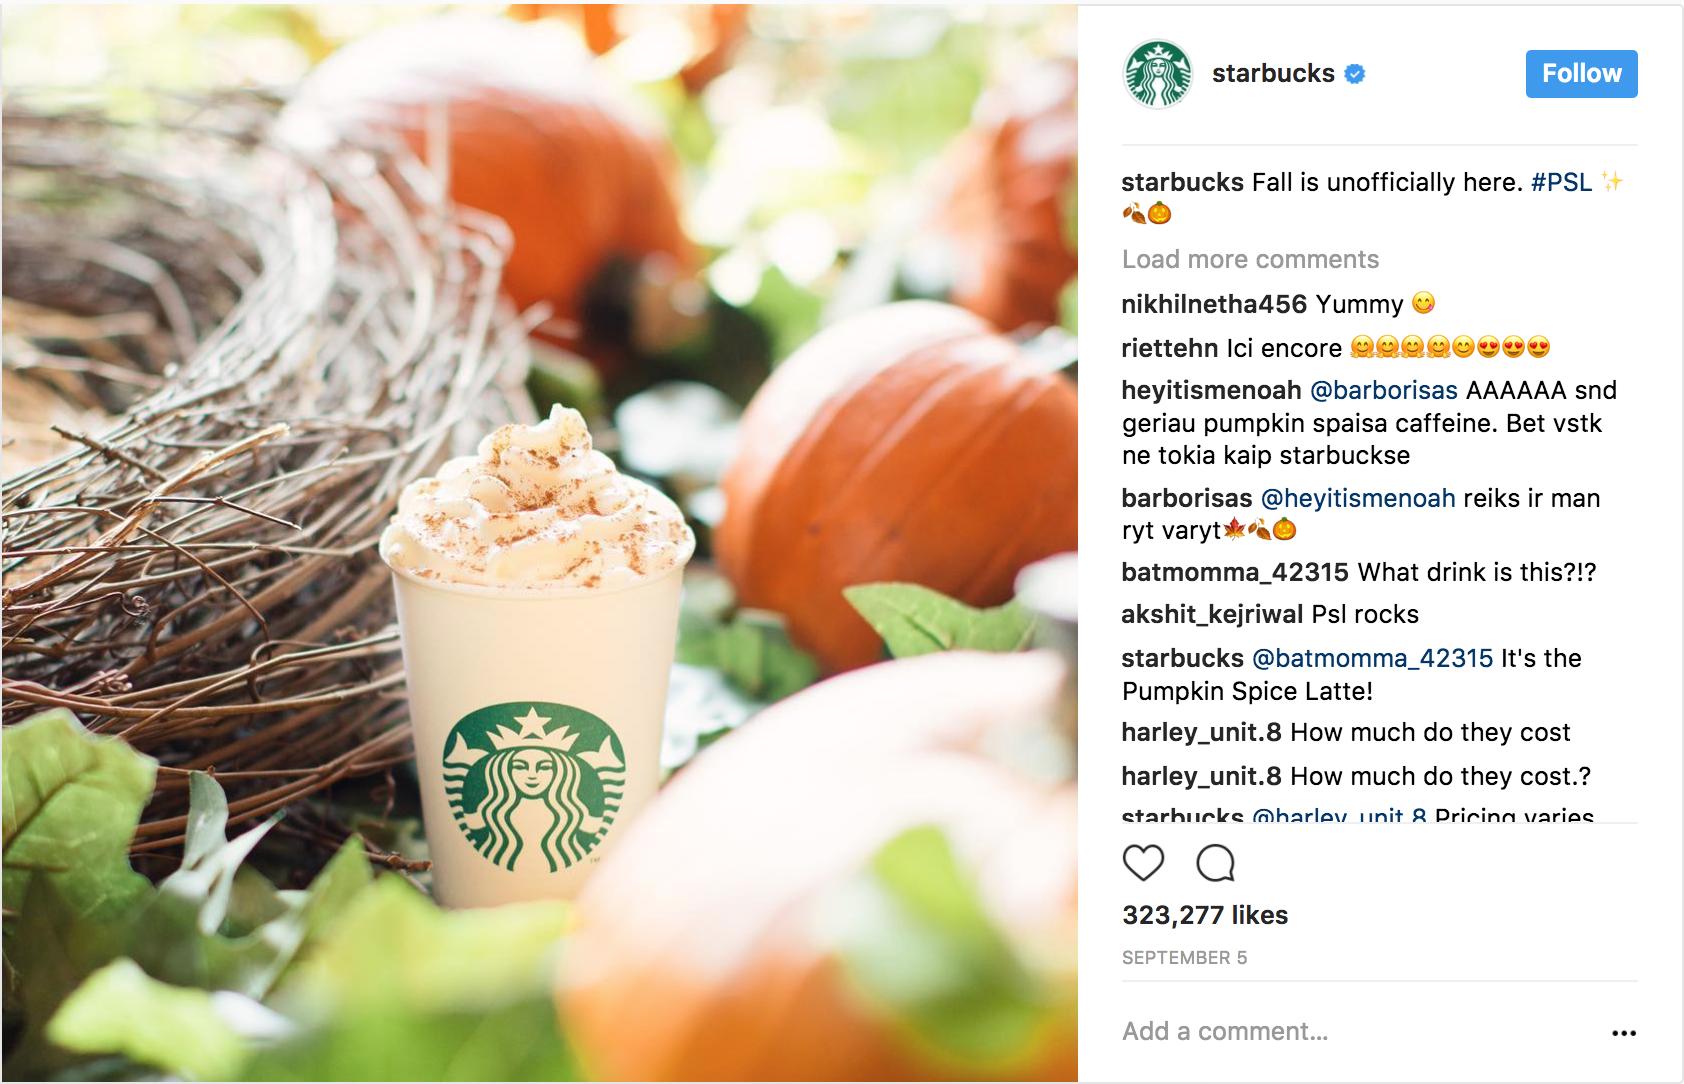 Starbucks TheRealPSL Instagram account